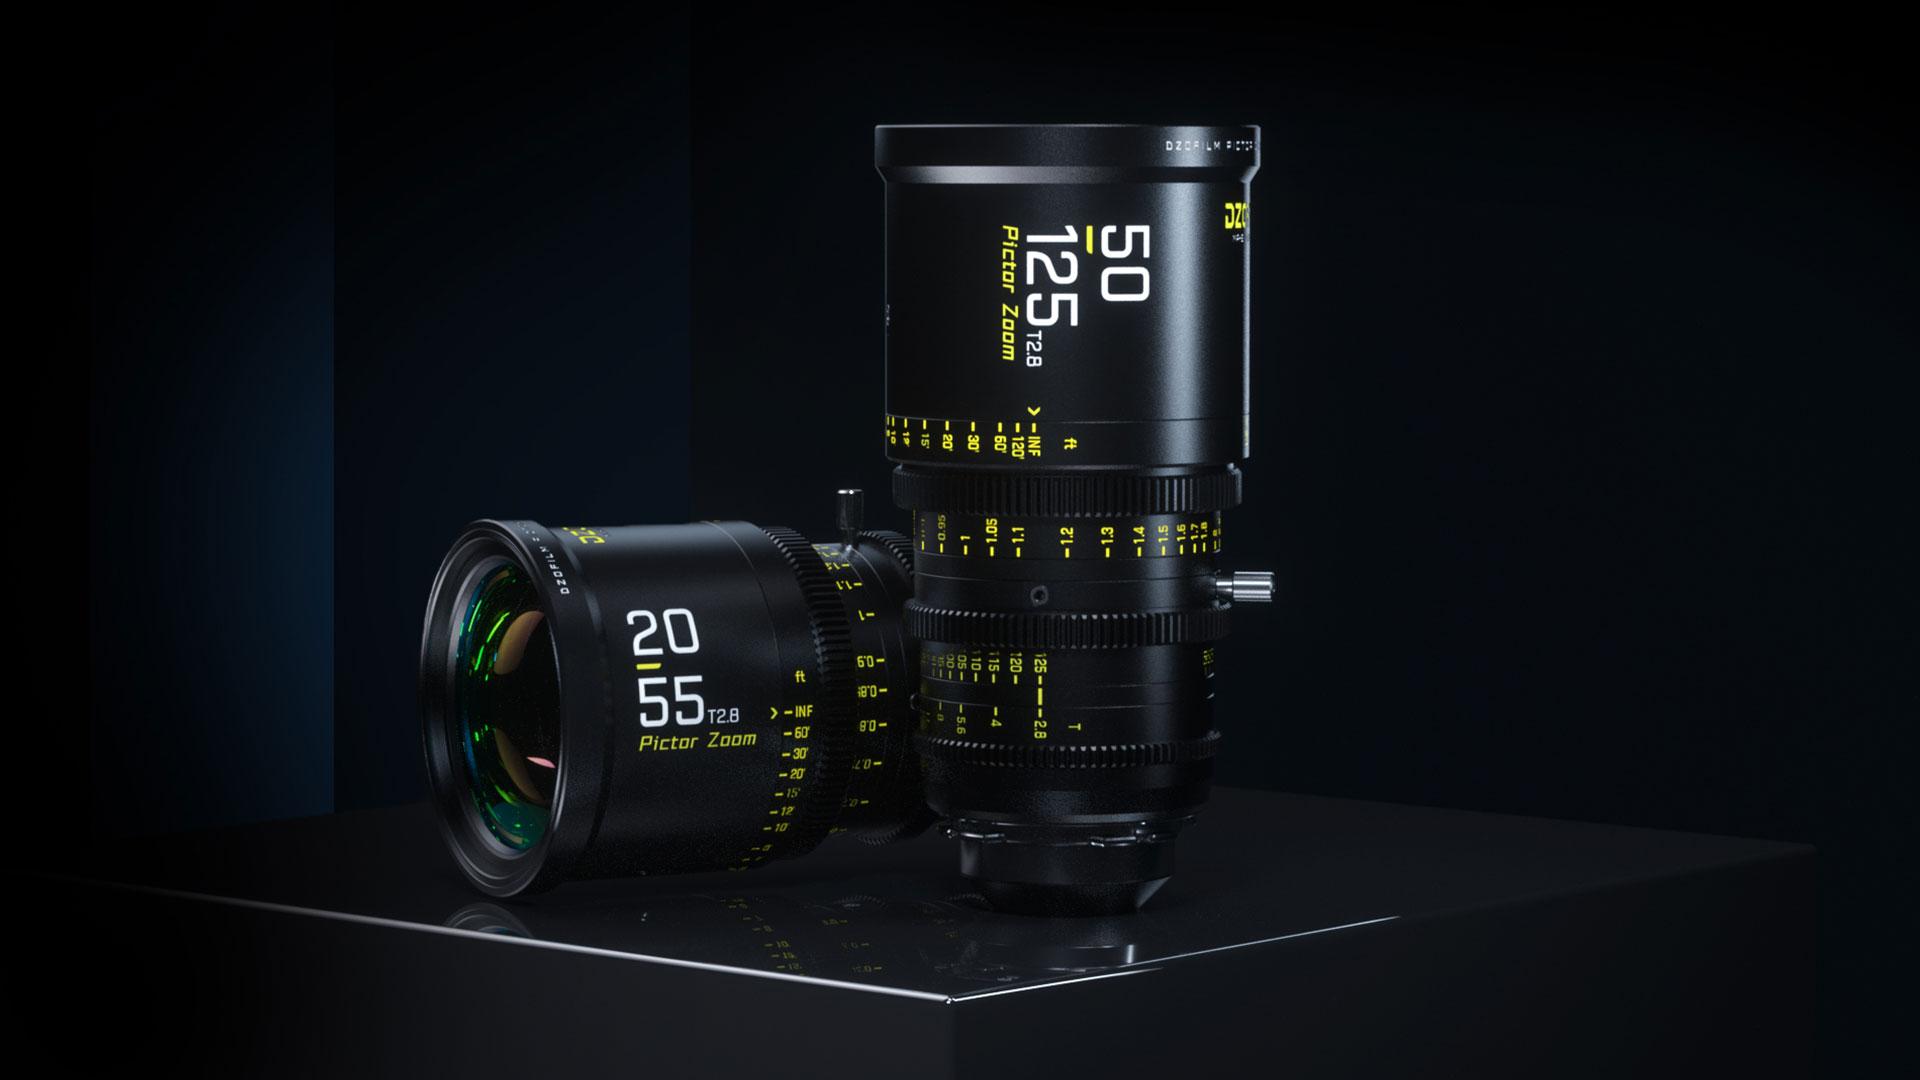 DZOFILM Presentó los lentes zoom Super 35 mm 20-55 mm y 50-125 mm T2.8